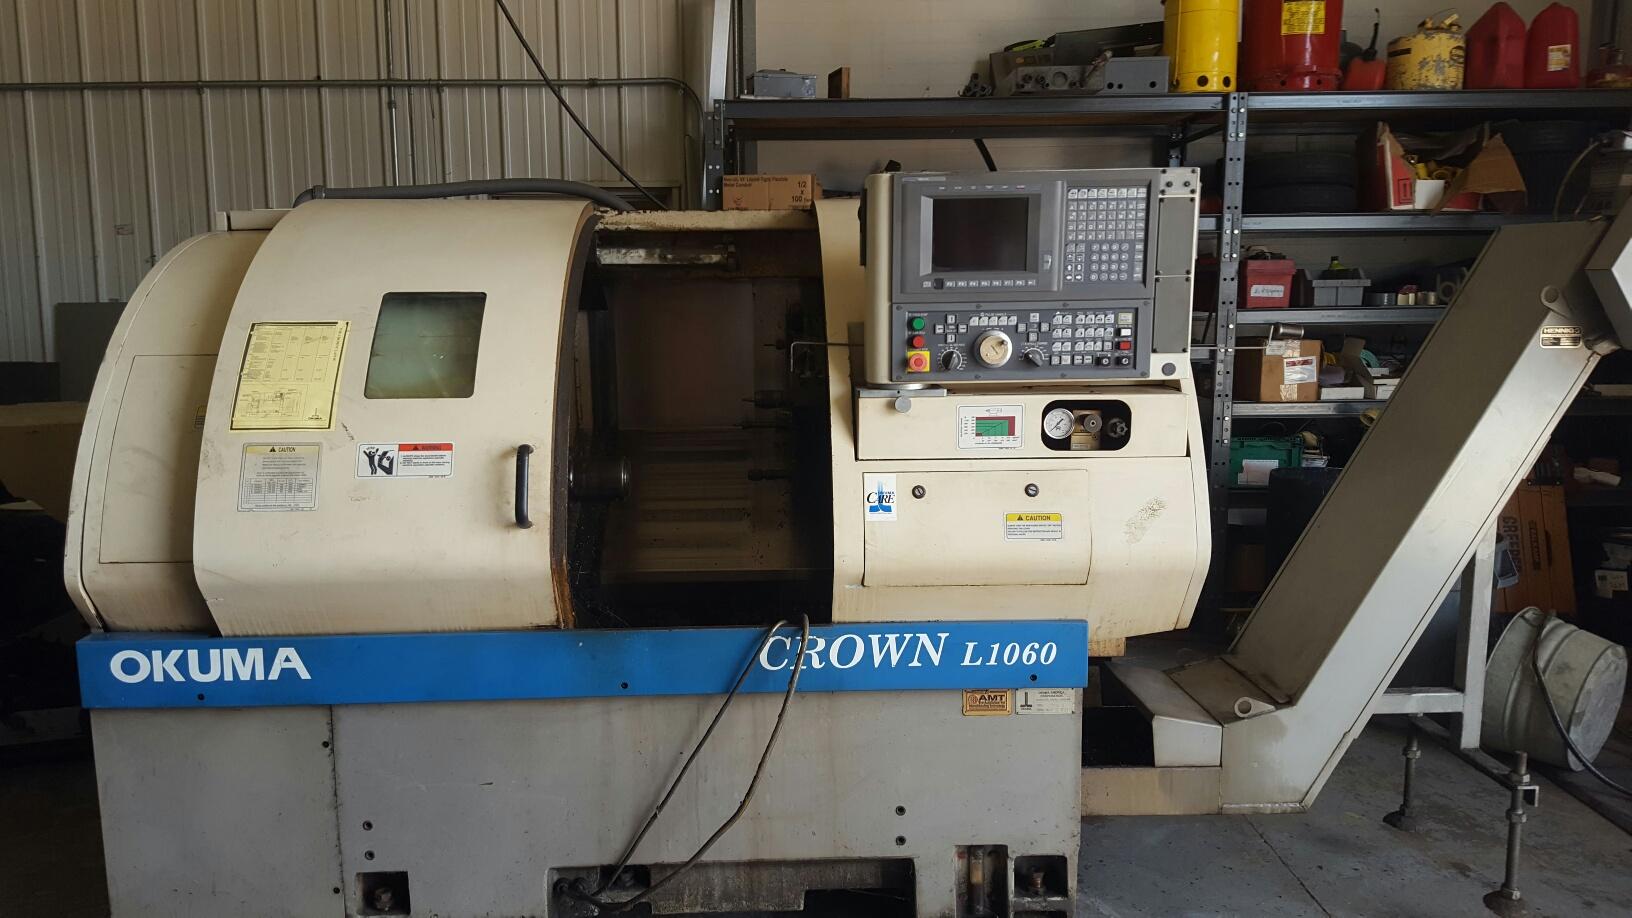 (1) PREOWNED OKUMA CROWN CNC LATHE, MODEL L1060, S/N 1709